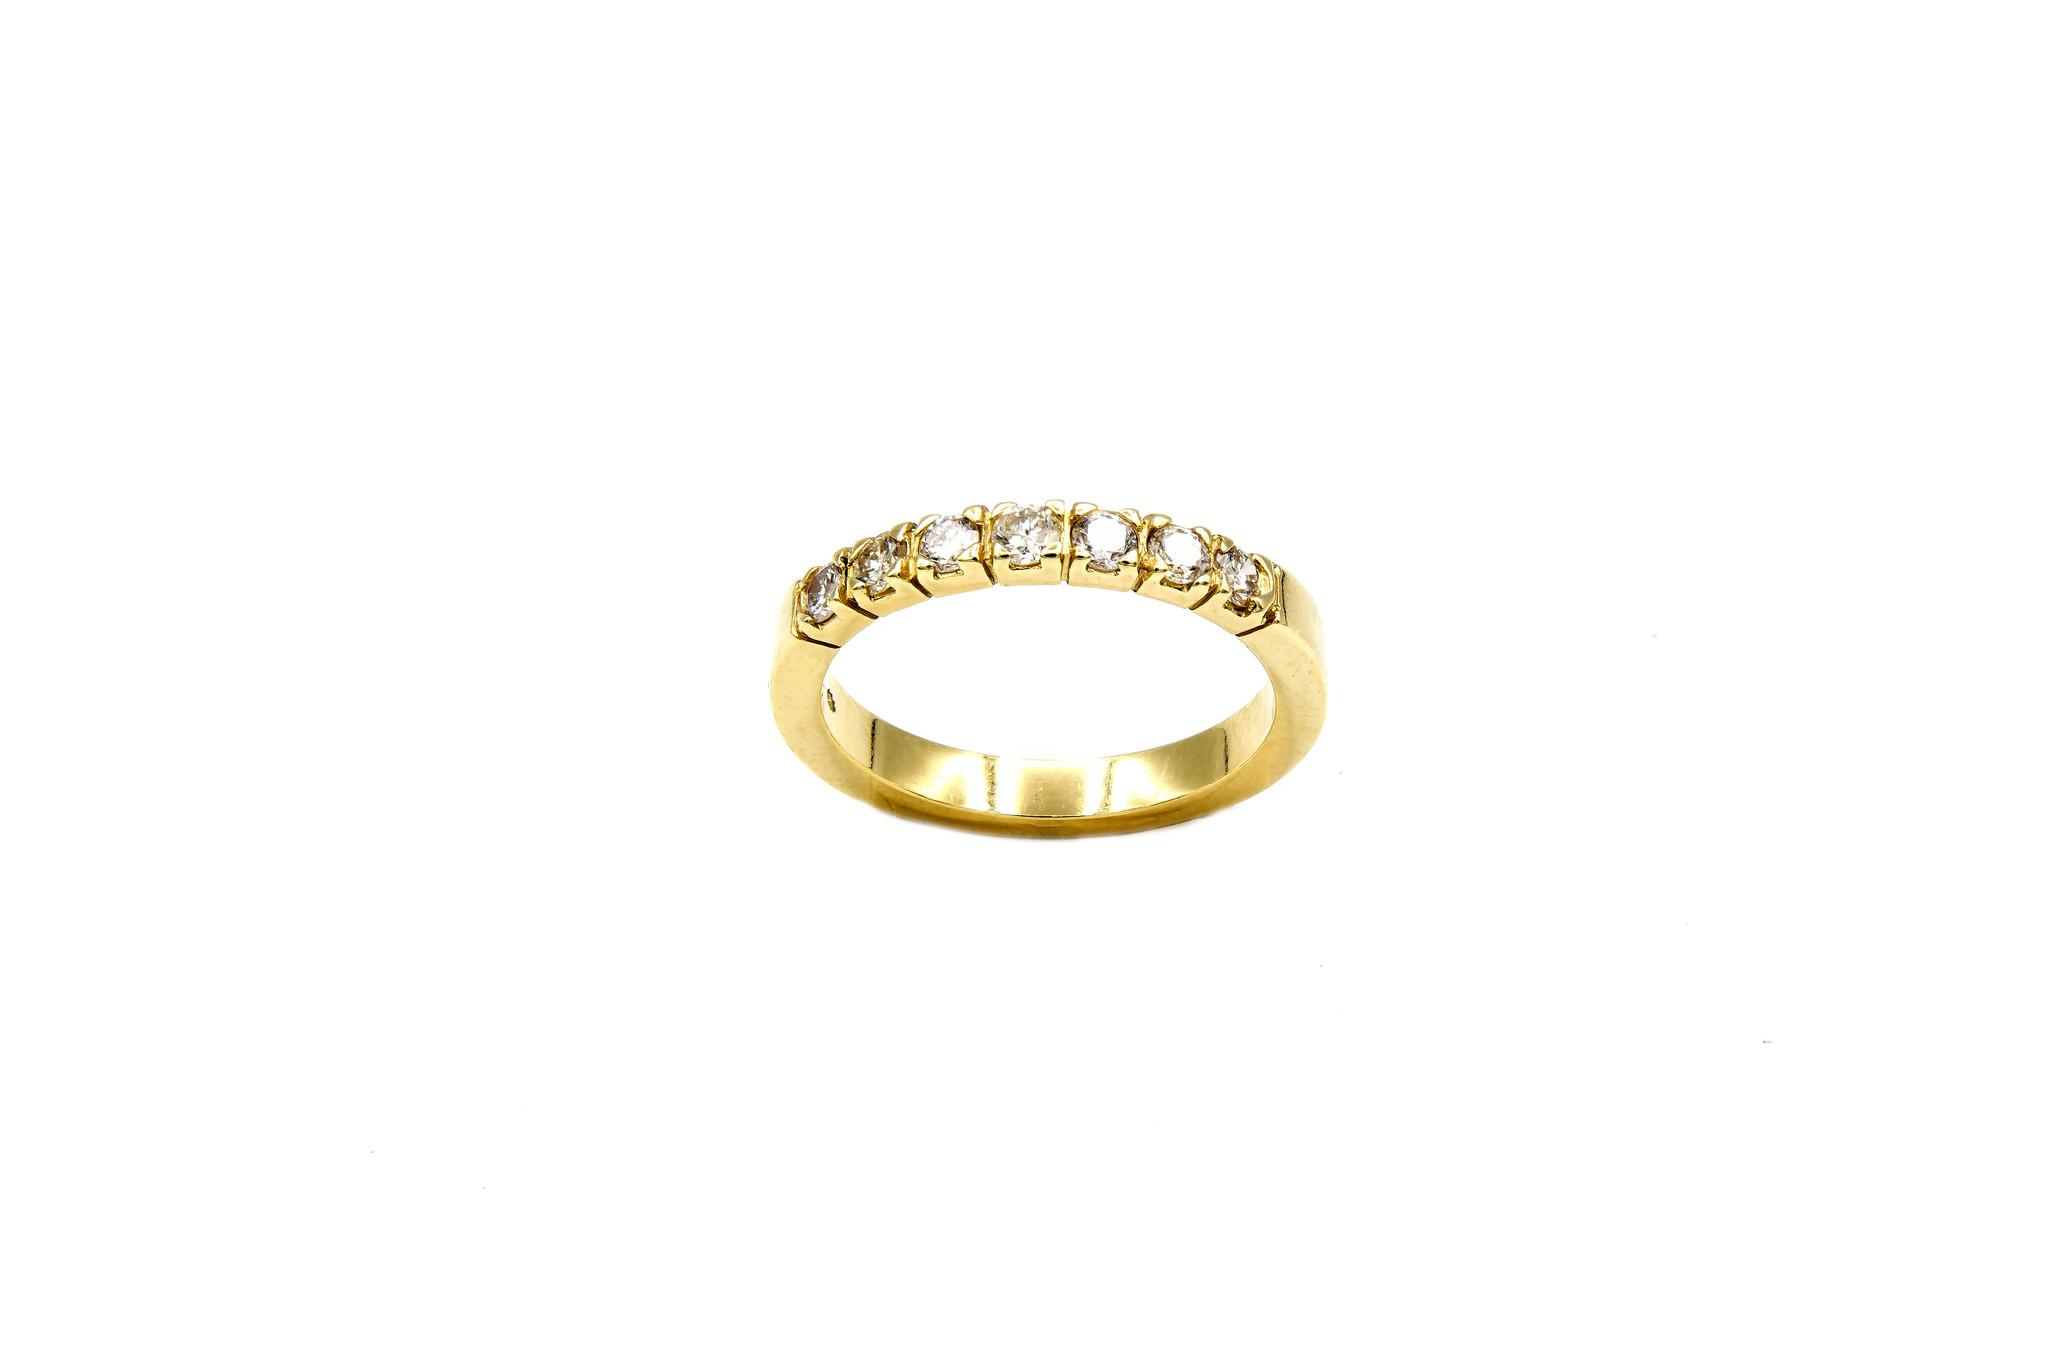 Ring verlovingsring klassiek met 7 diamanten ingezet-4